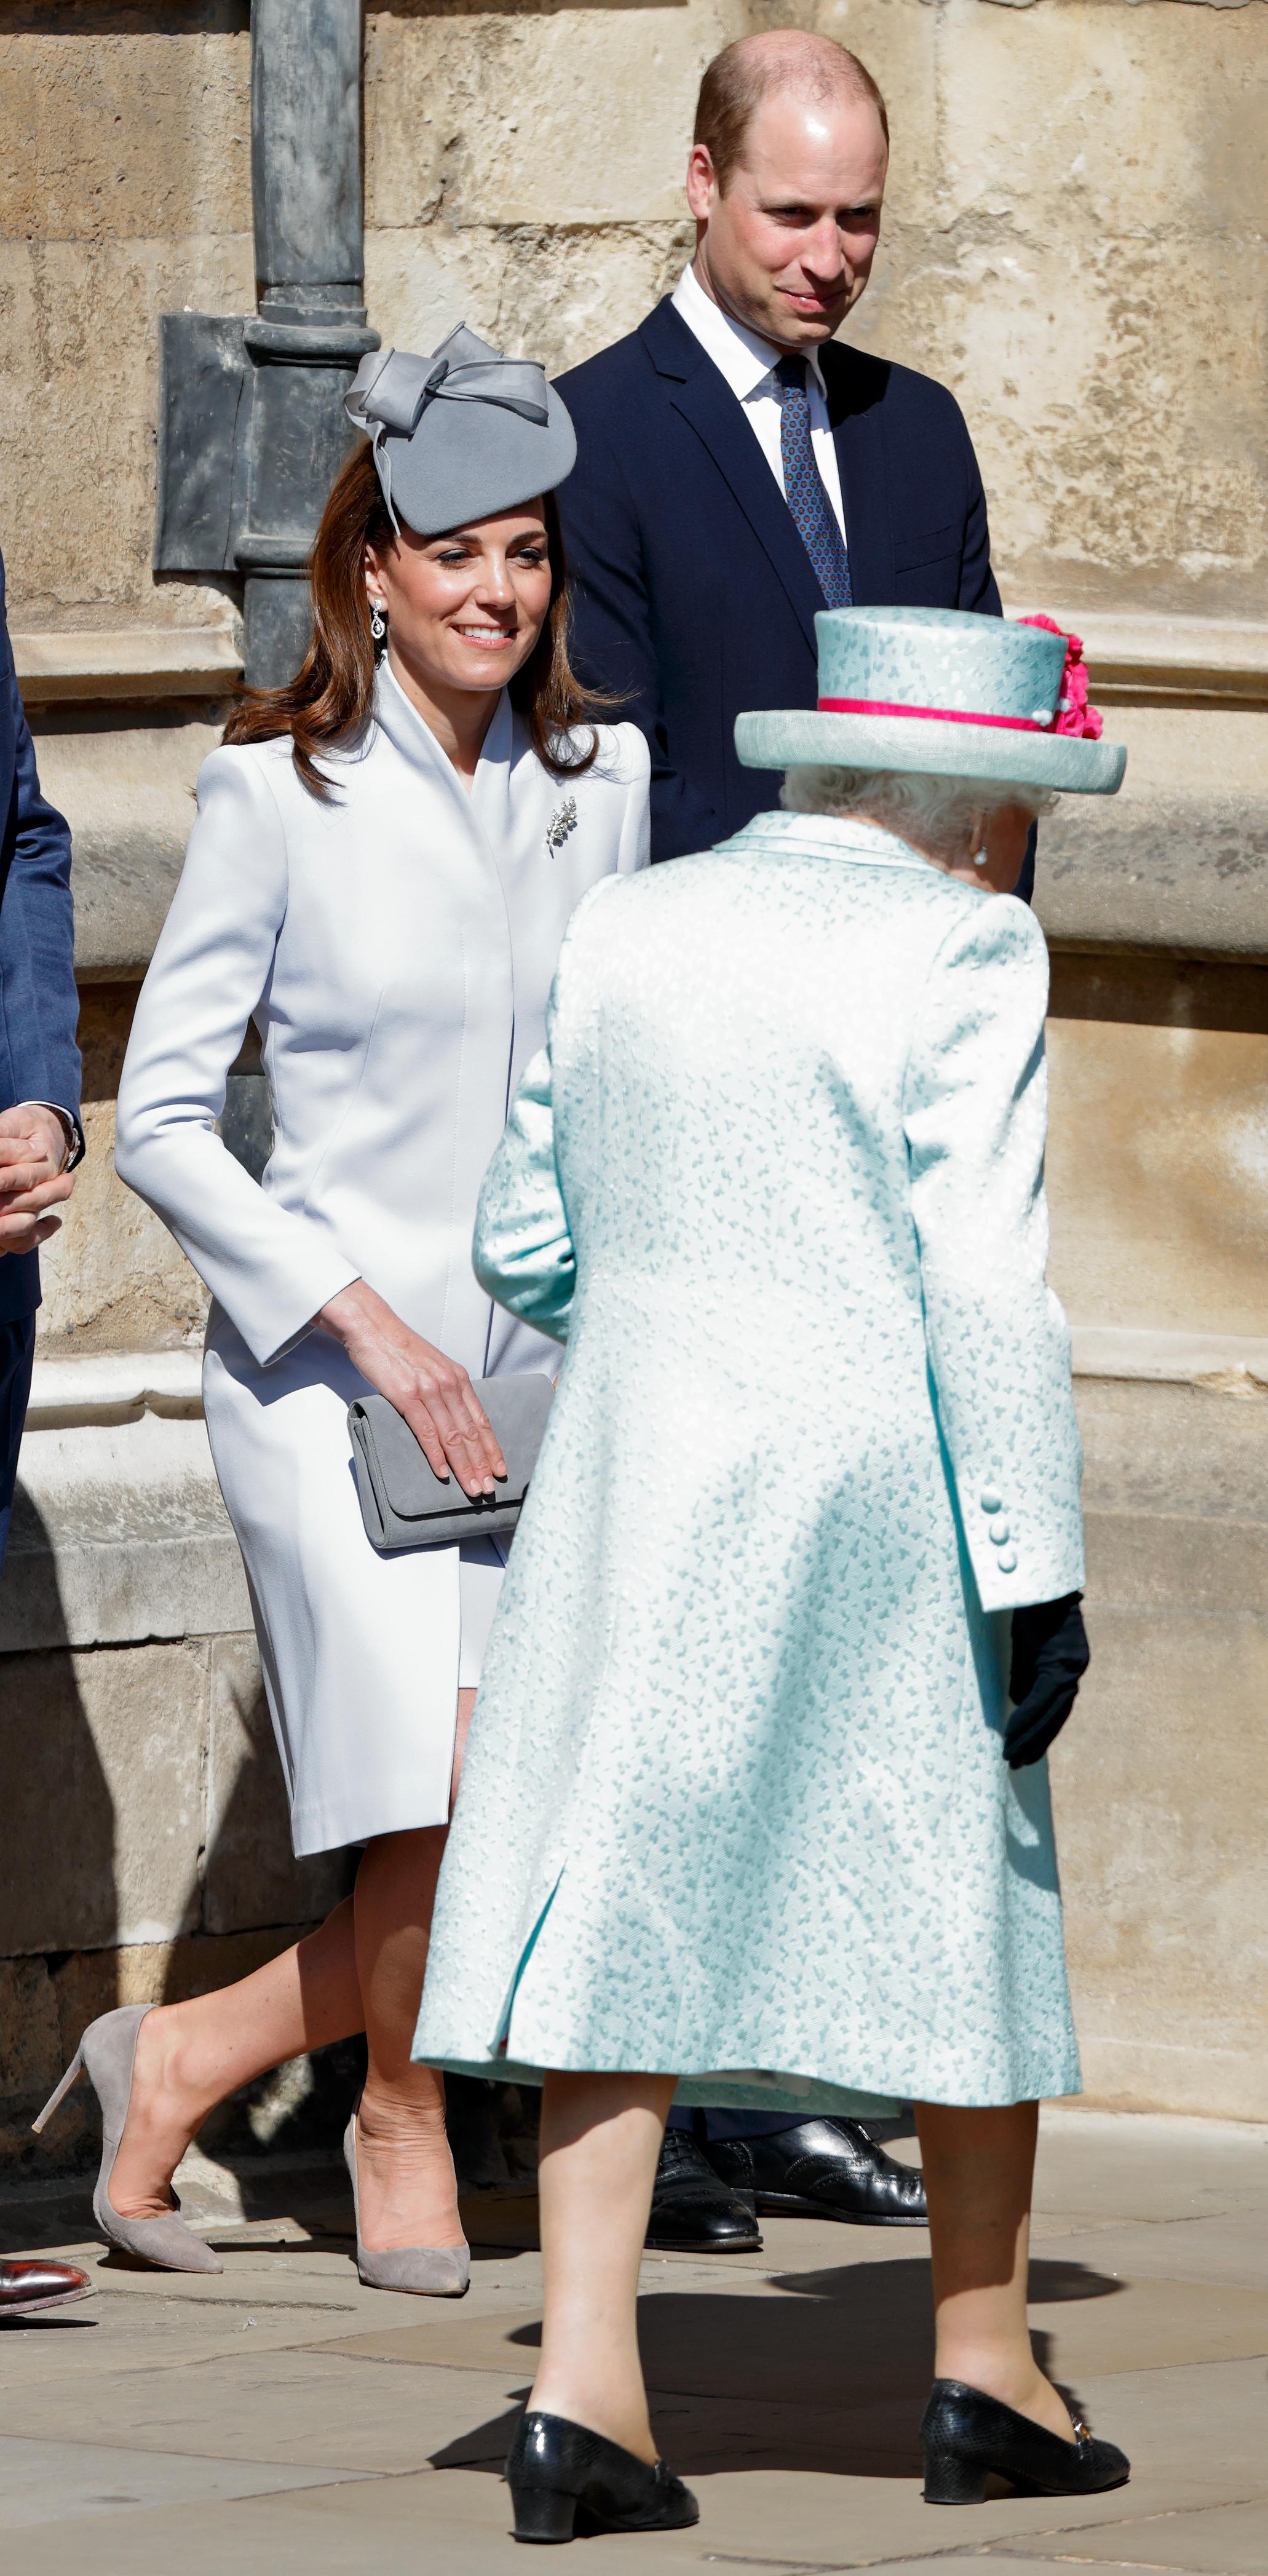 kate middleton curtsying queen elizabeth